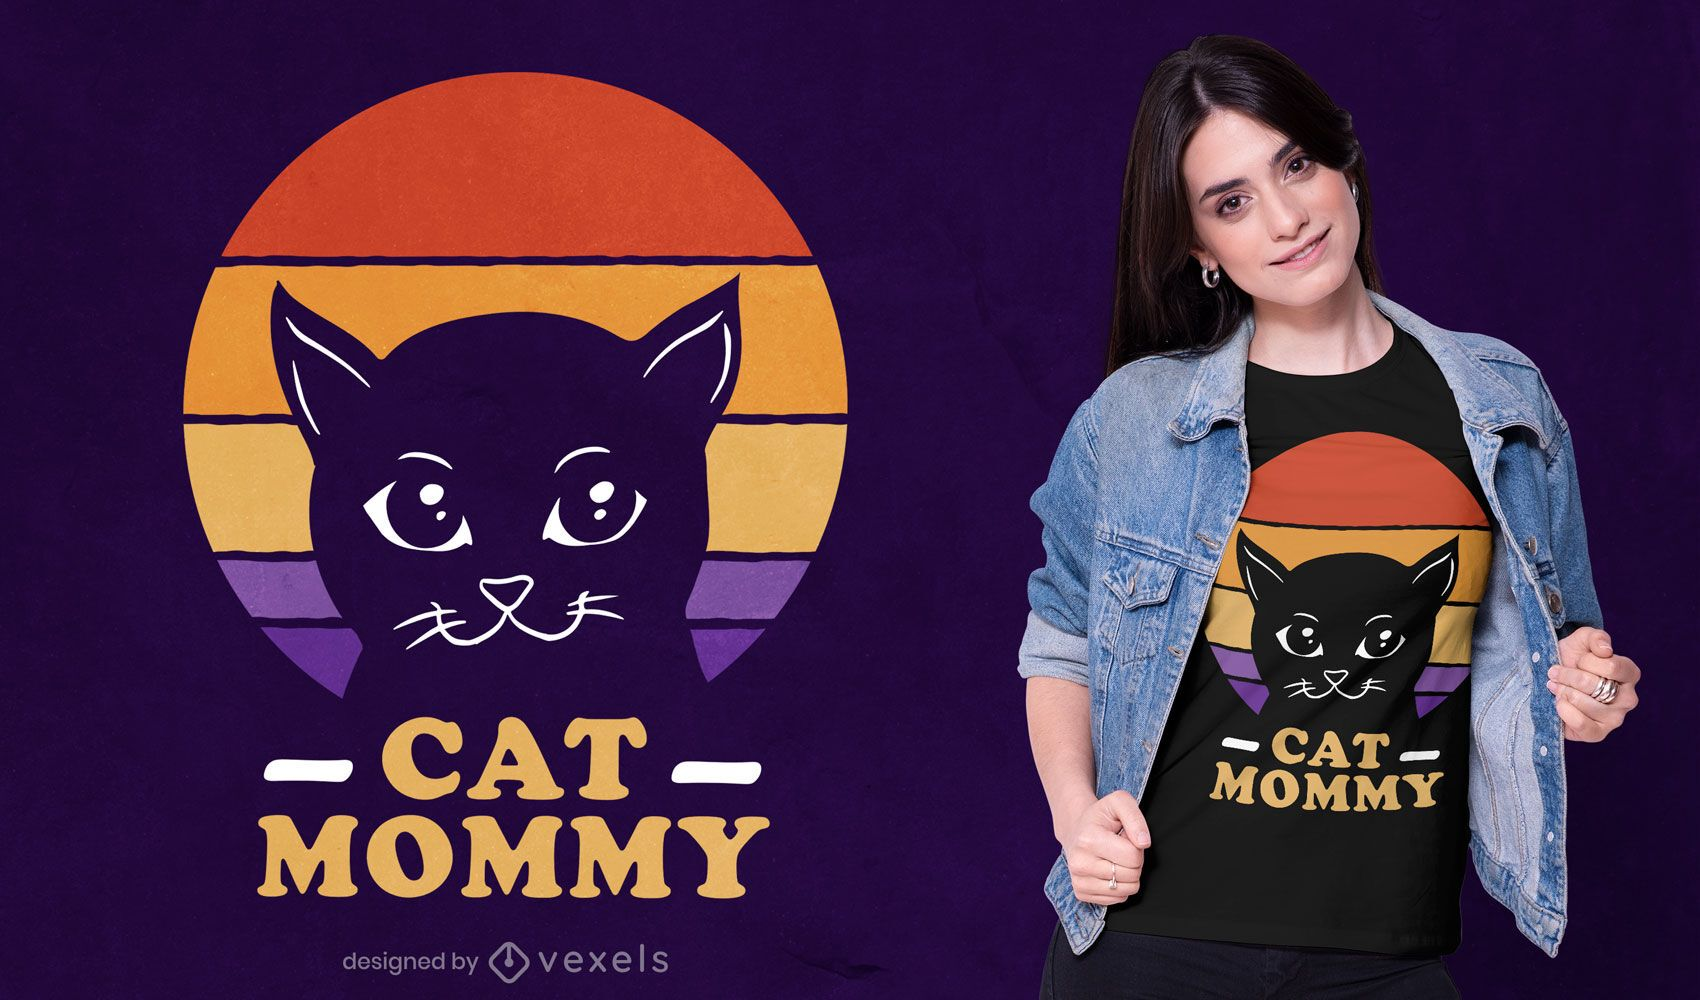 Cat mommy retro t-shirt design